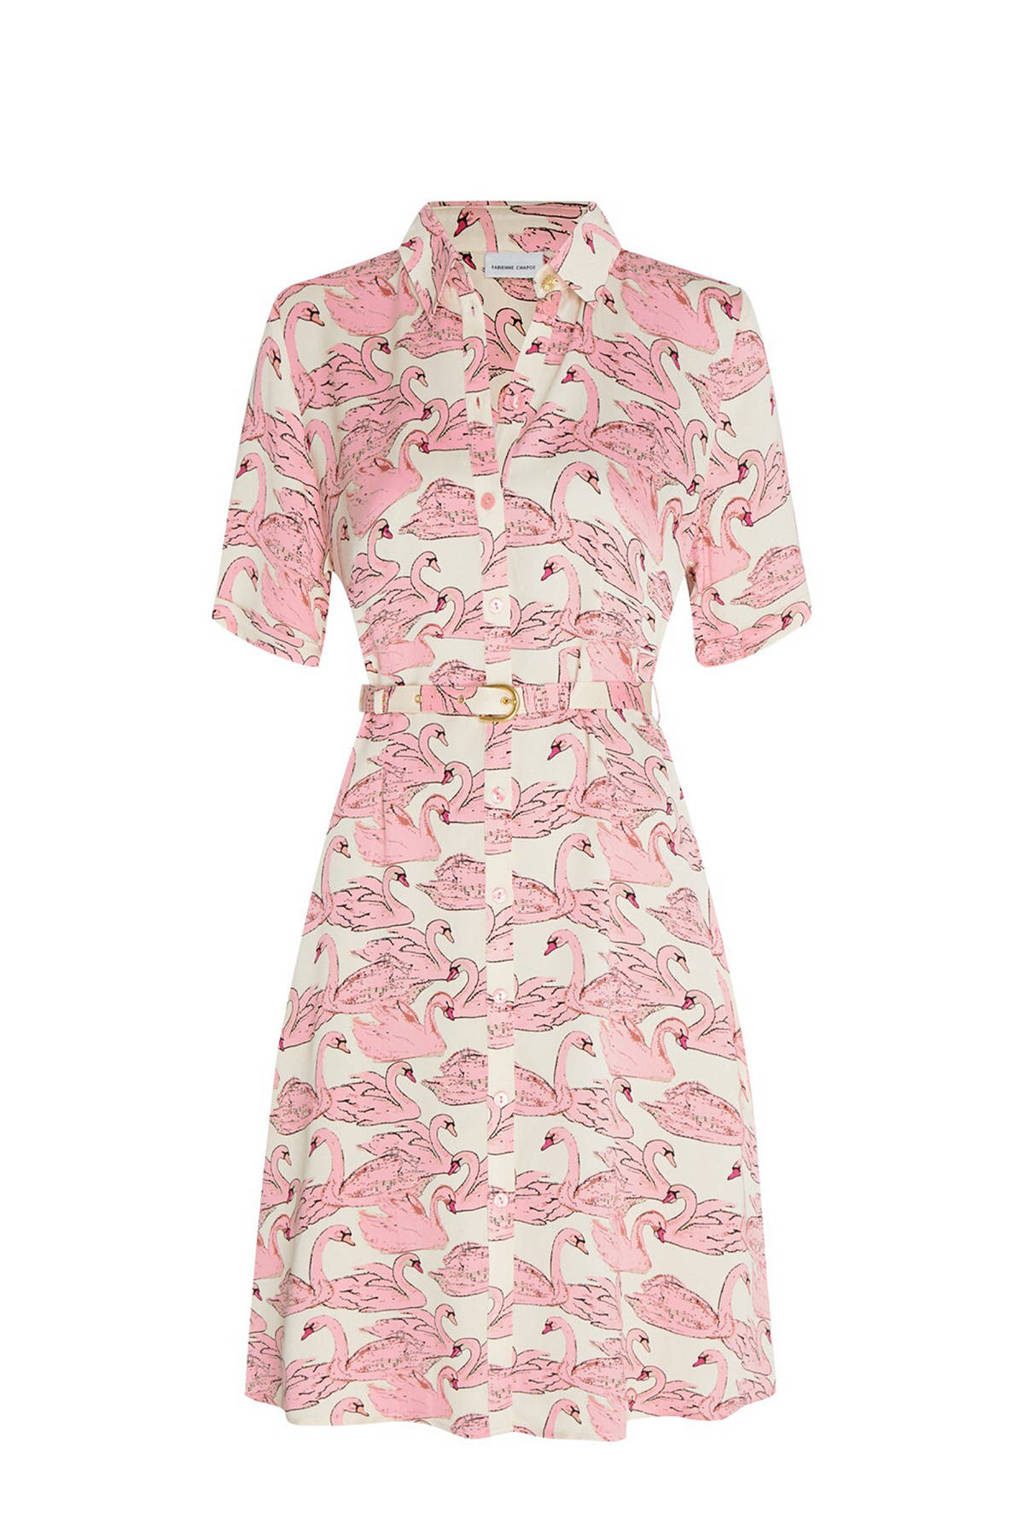 Fabienne Chapot blousejurk Mila met all over print en ceintuur lichtroze, Lichtroze